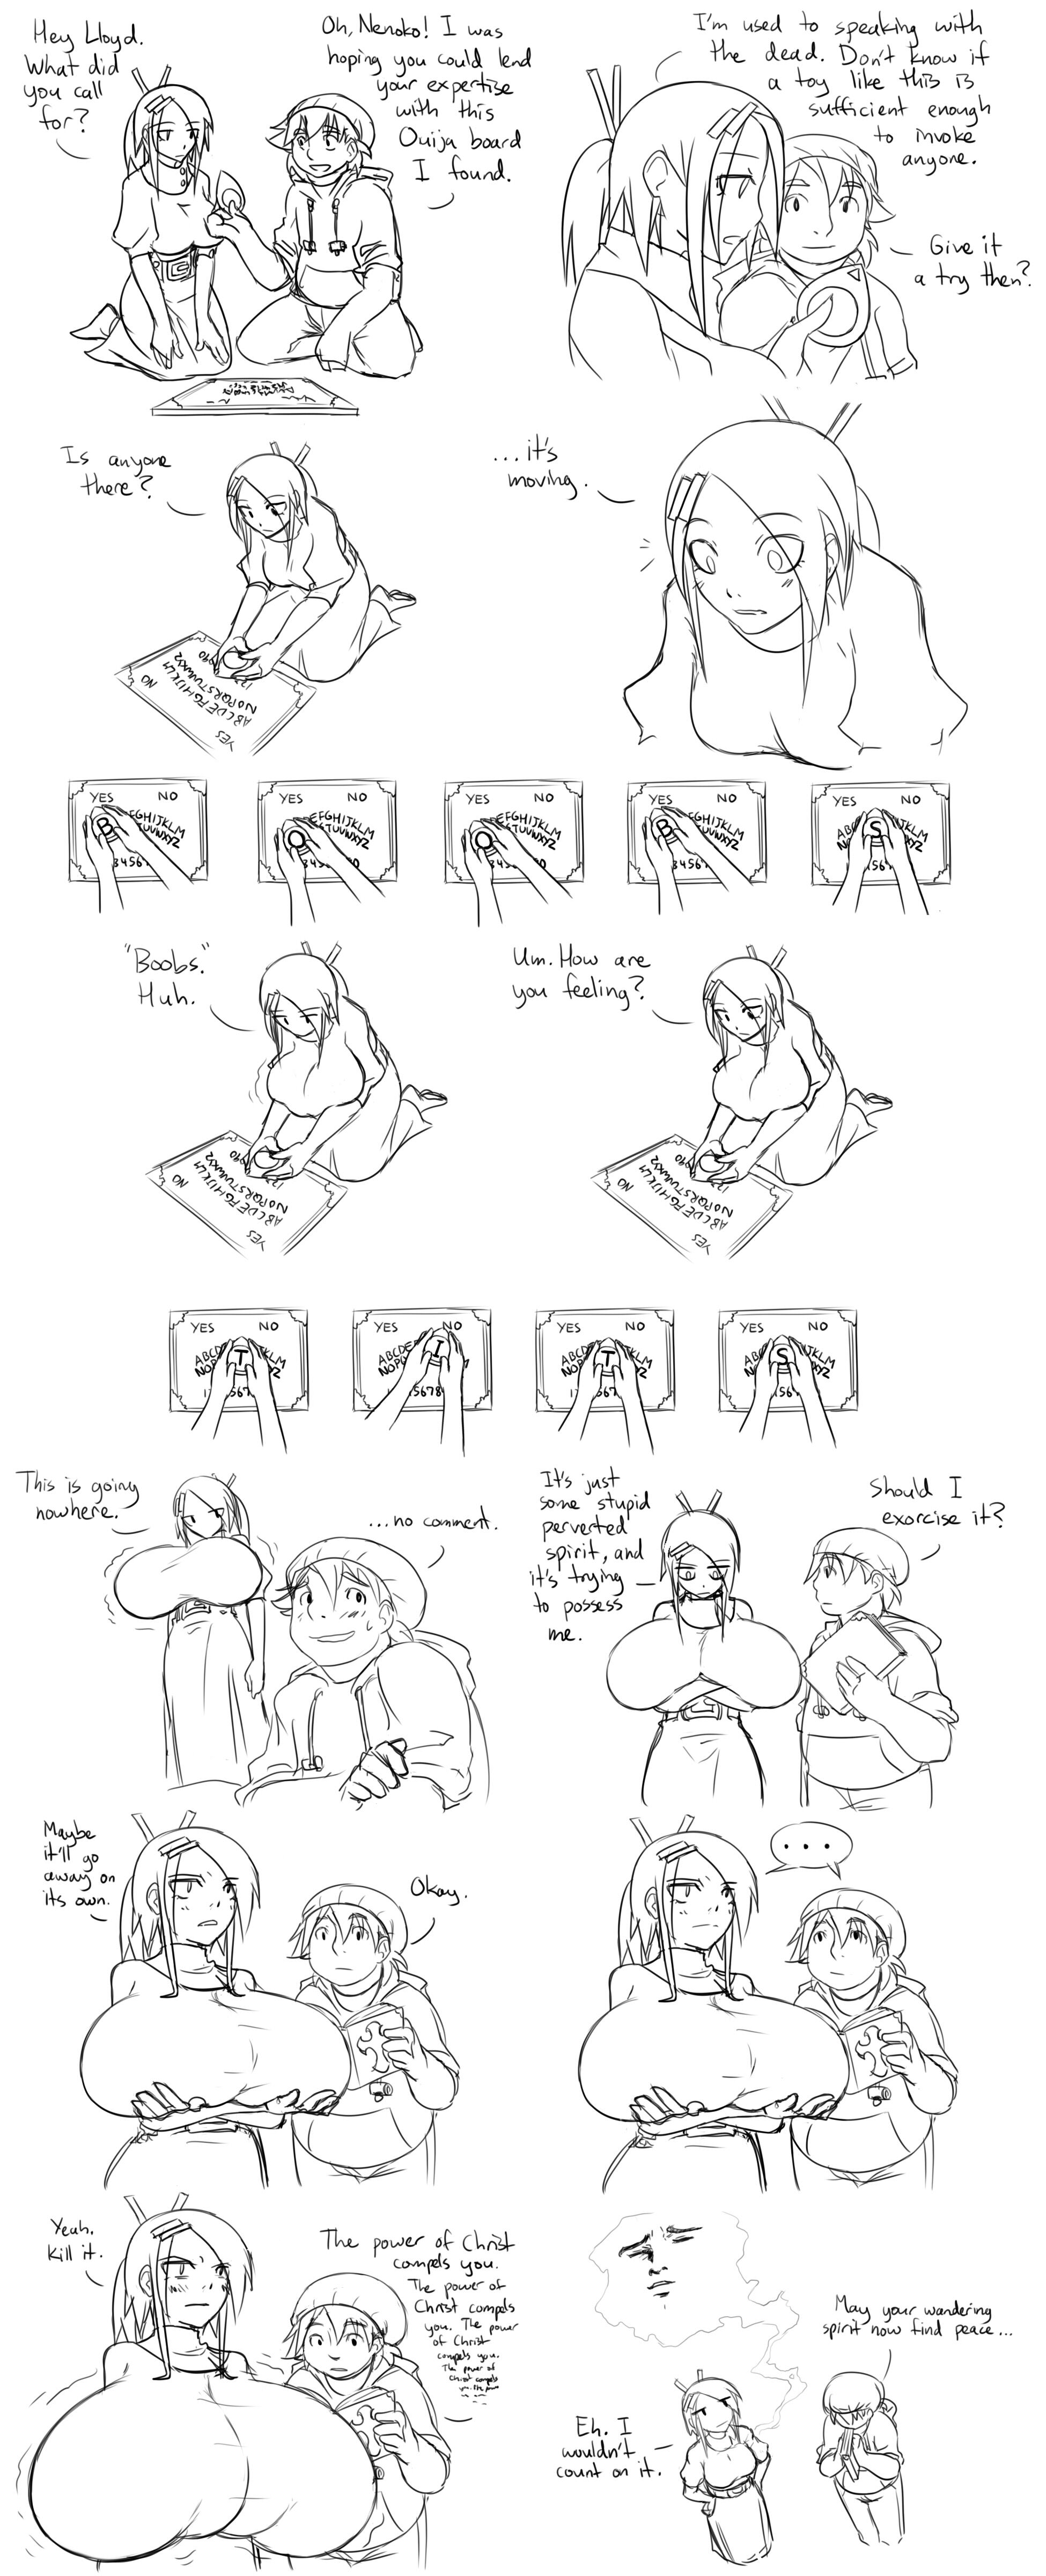 Ghost Busting by Matsu-sensei